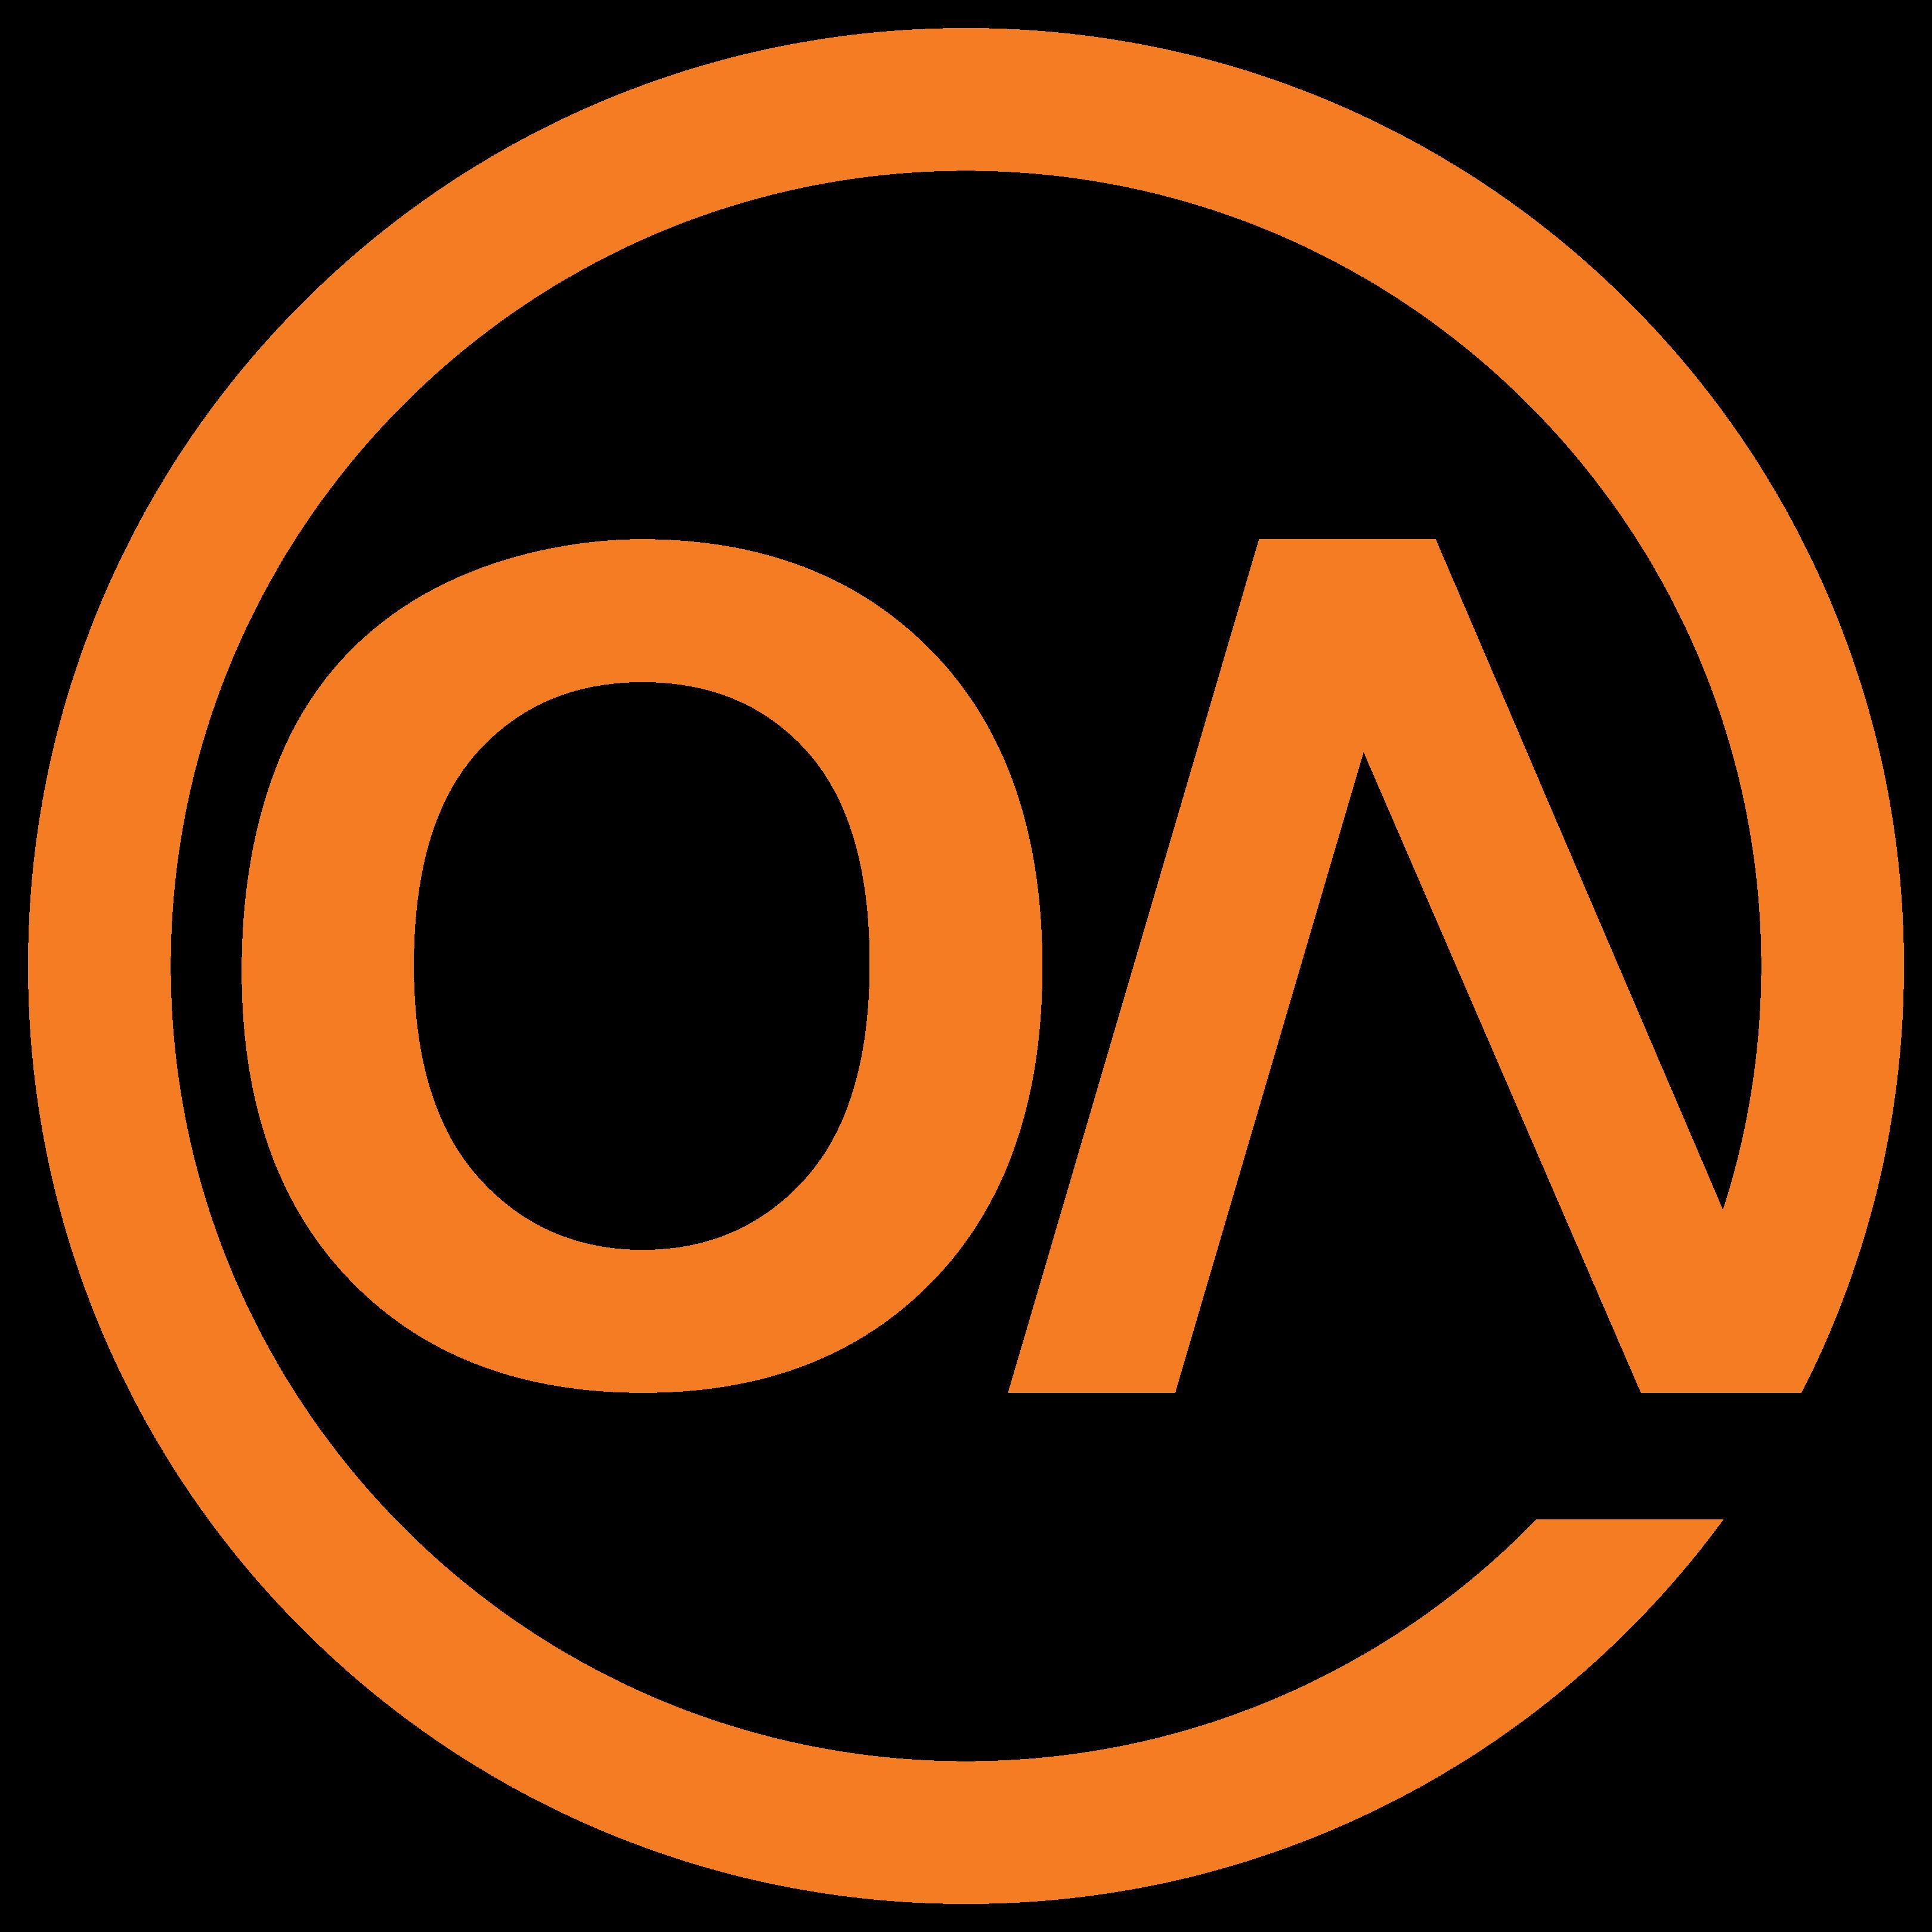 logo omahalit 1